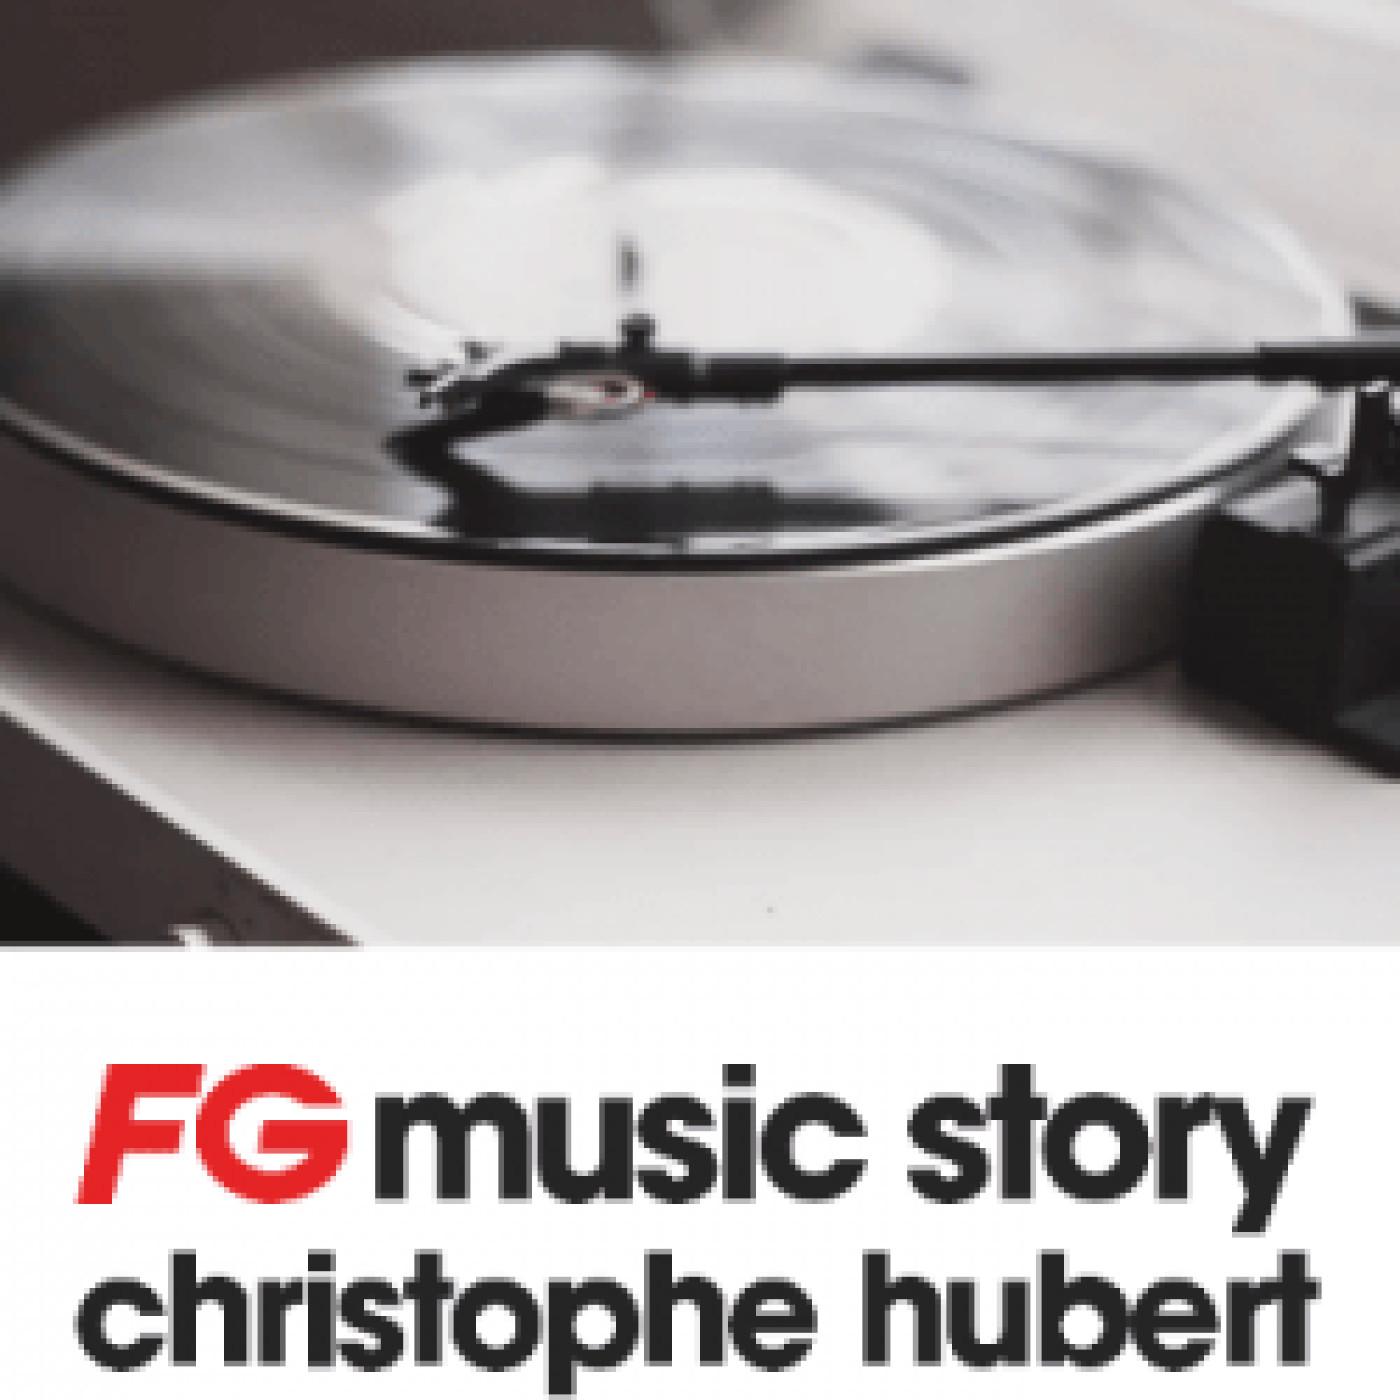 FG MUSIC STORY : DISCLOSURE